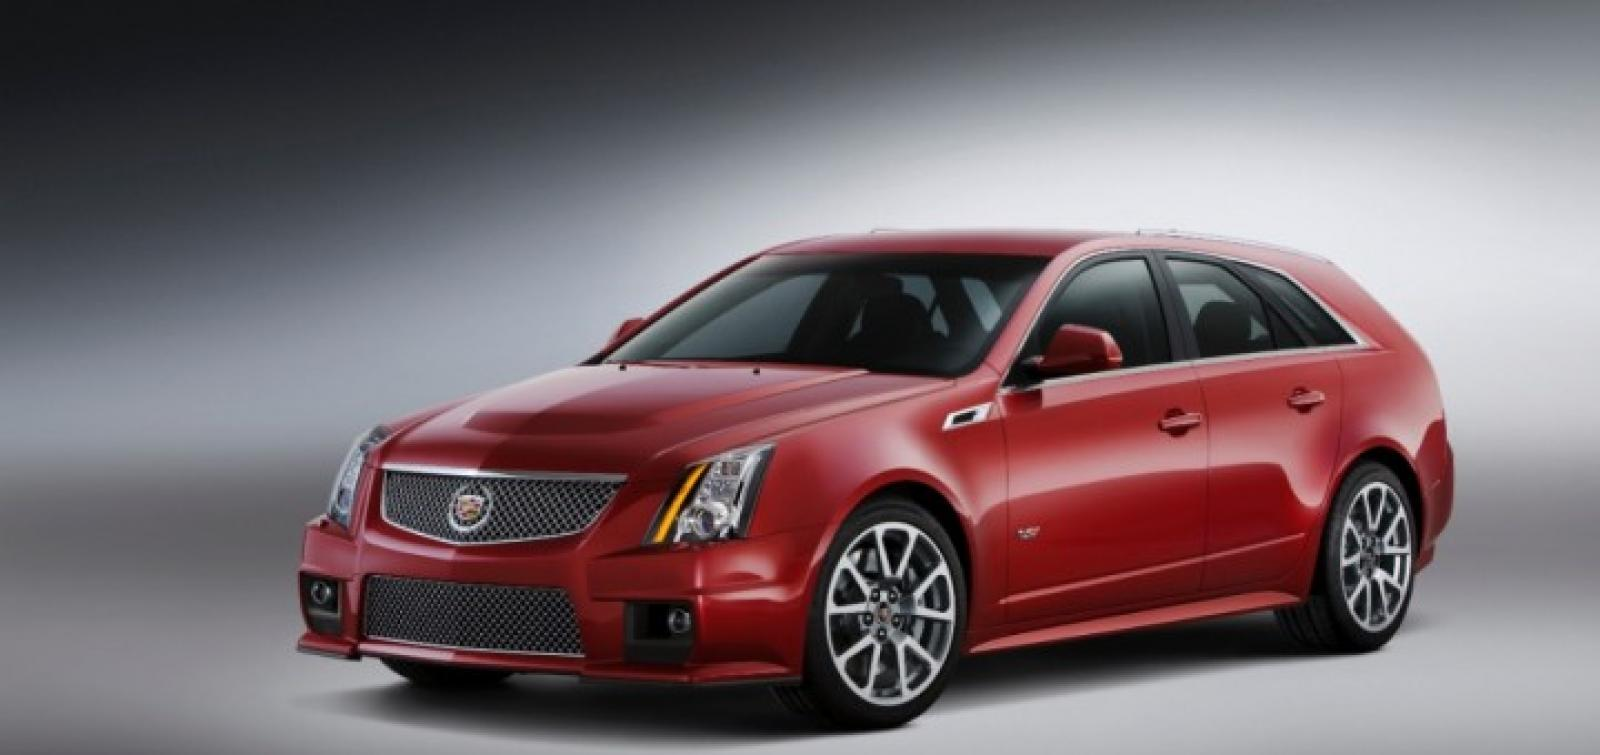 2014 Cadillac Cts V Wagon Information And Photos Zombiedrive